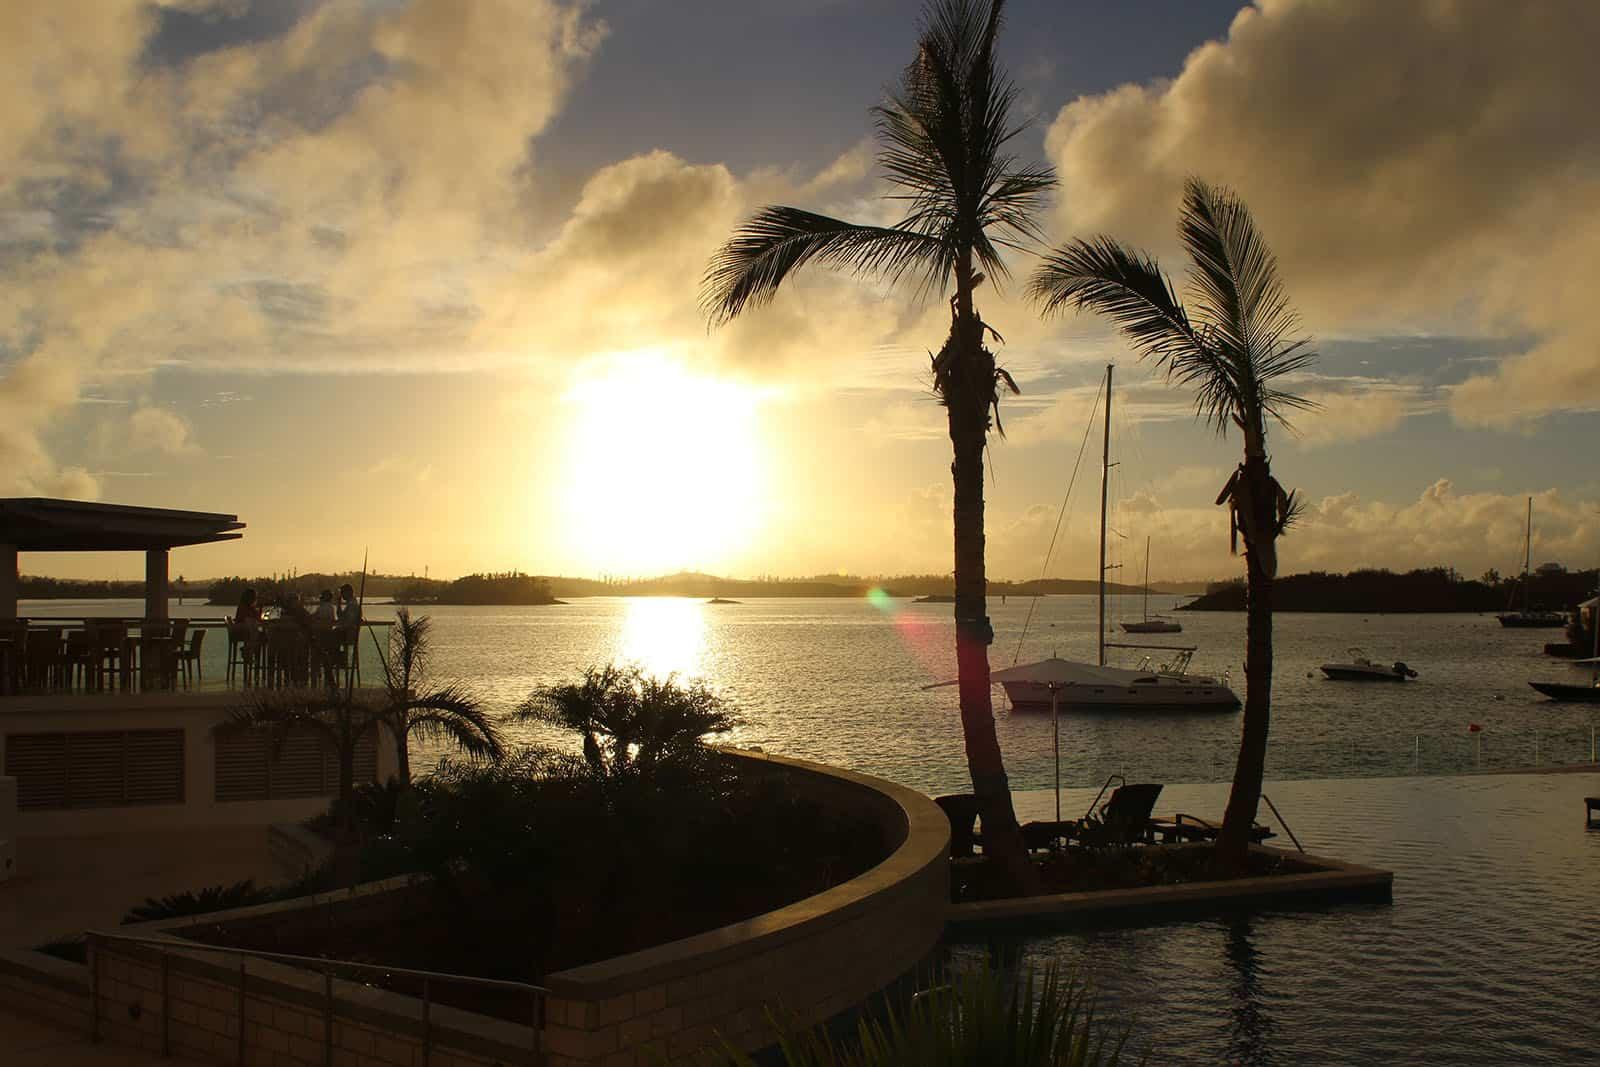 Fairmont Hamilton Princess Bermuda: Welcome to Paradise